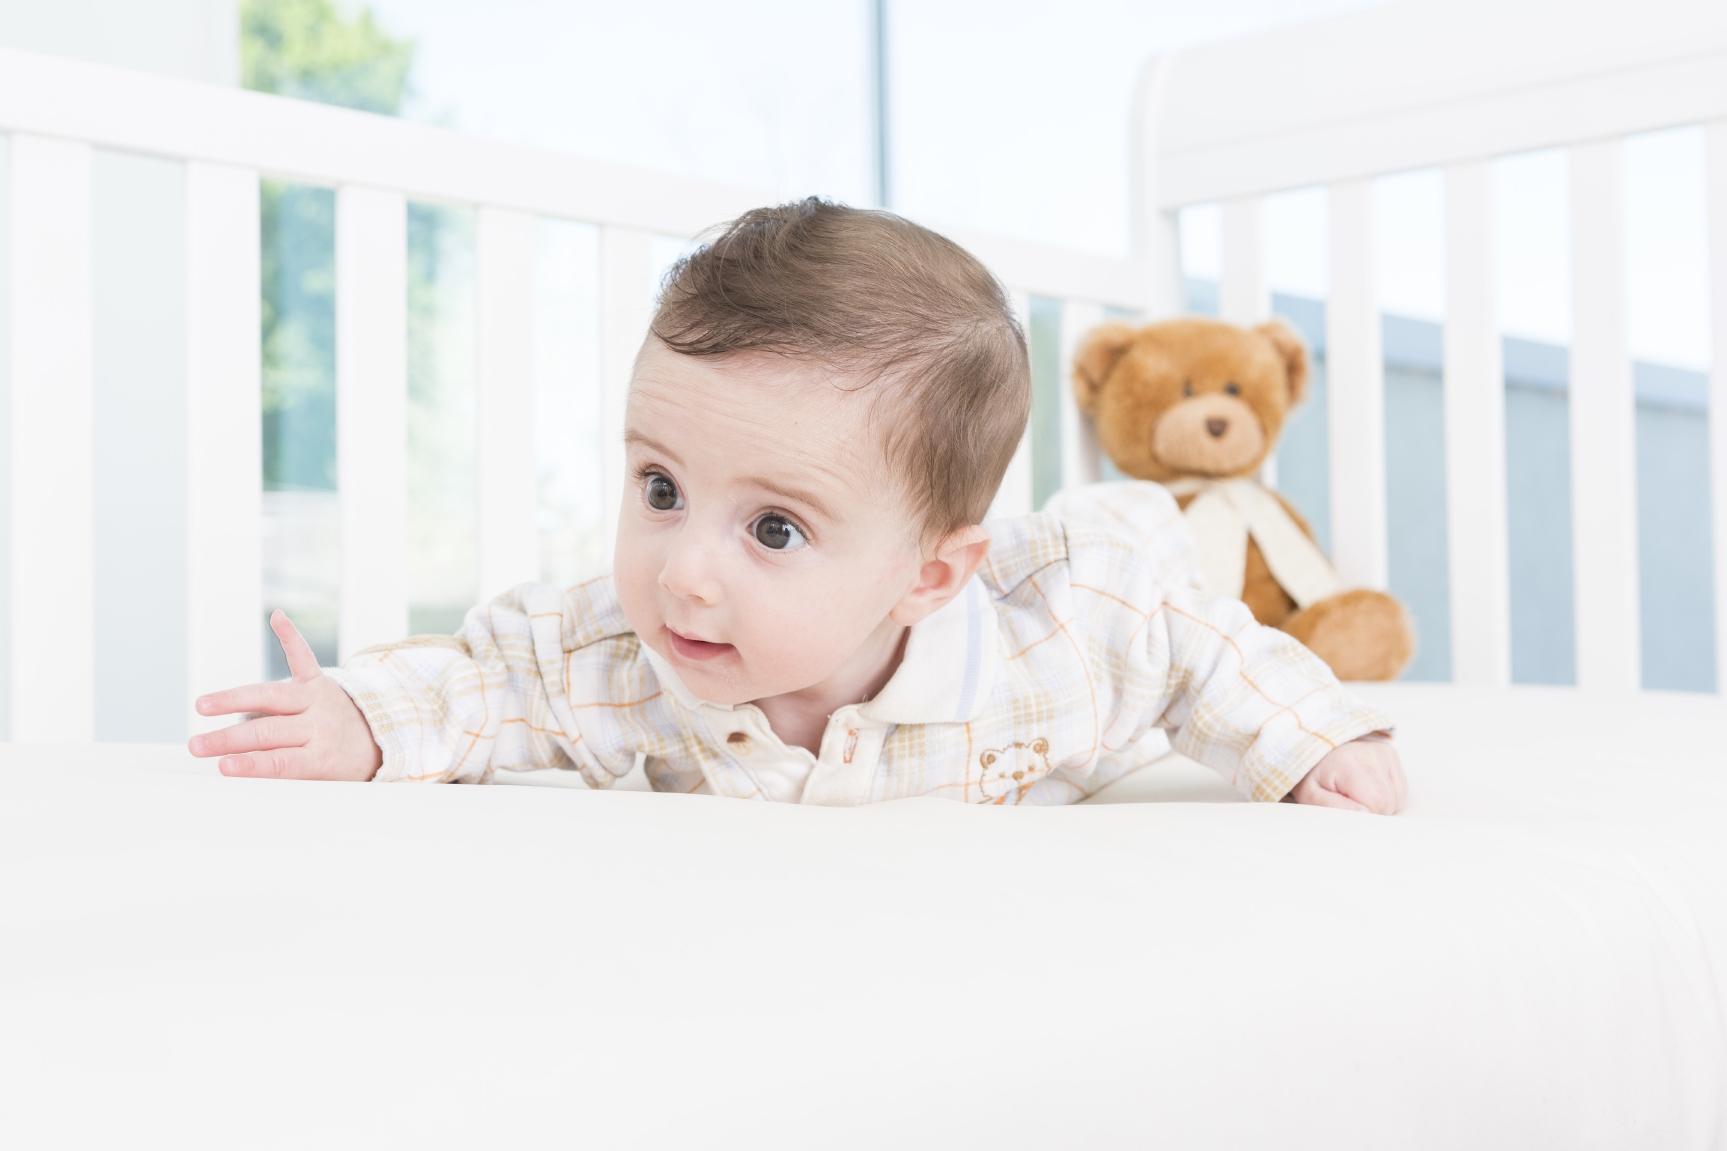 Matras bayi yang tepat